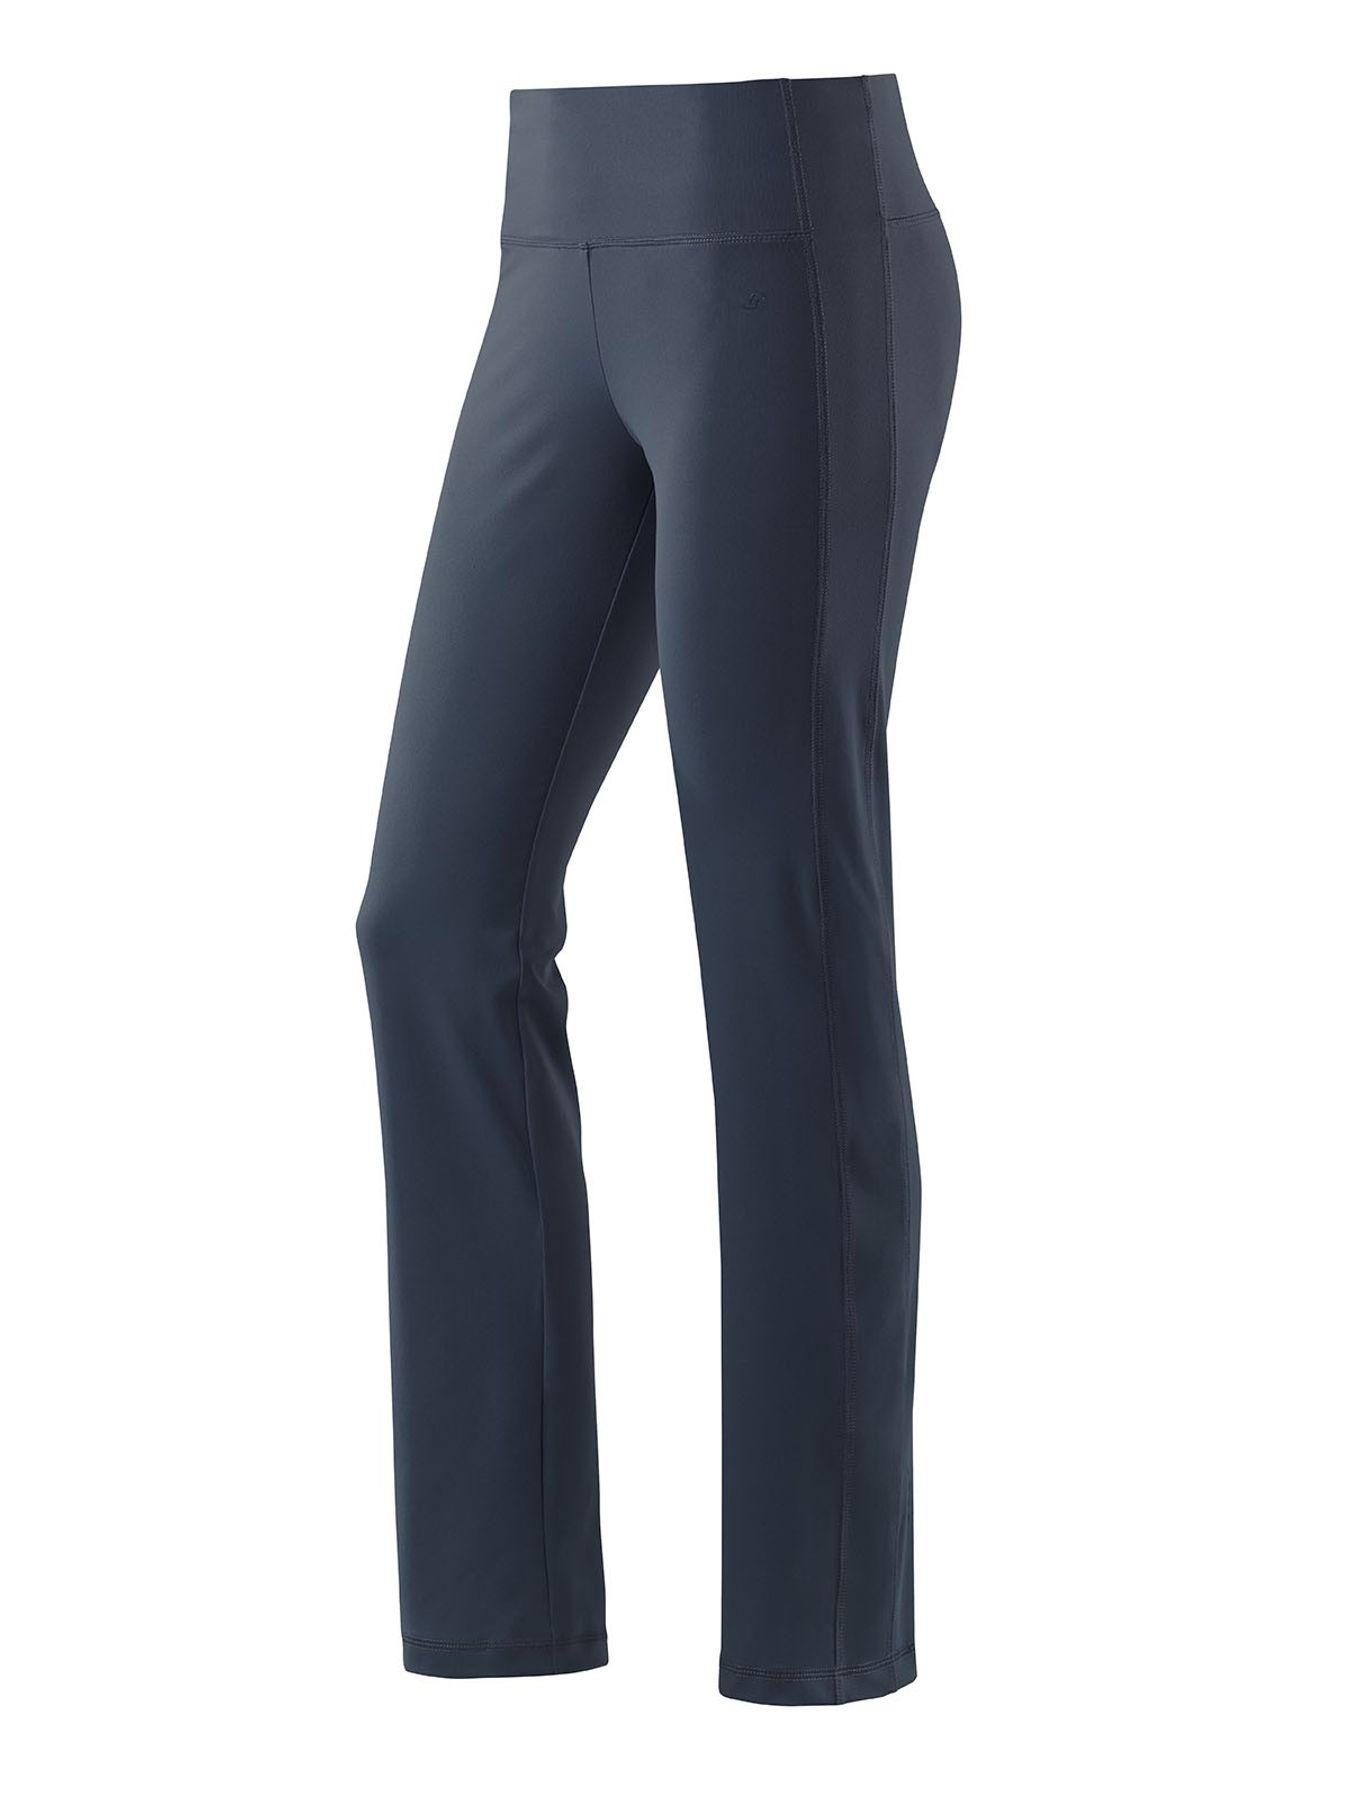 Joy - Bodyfit - Damen Sport Hose in verschiedenen Farben, Ester (30140) – Bild 3